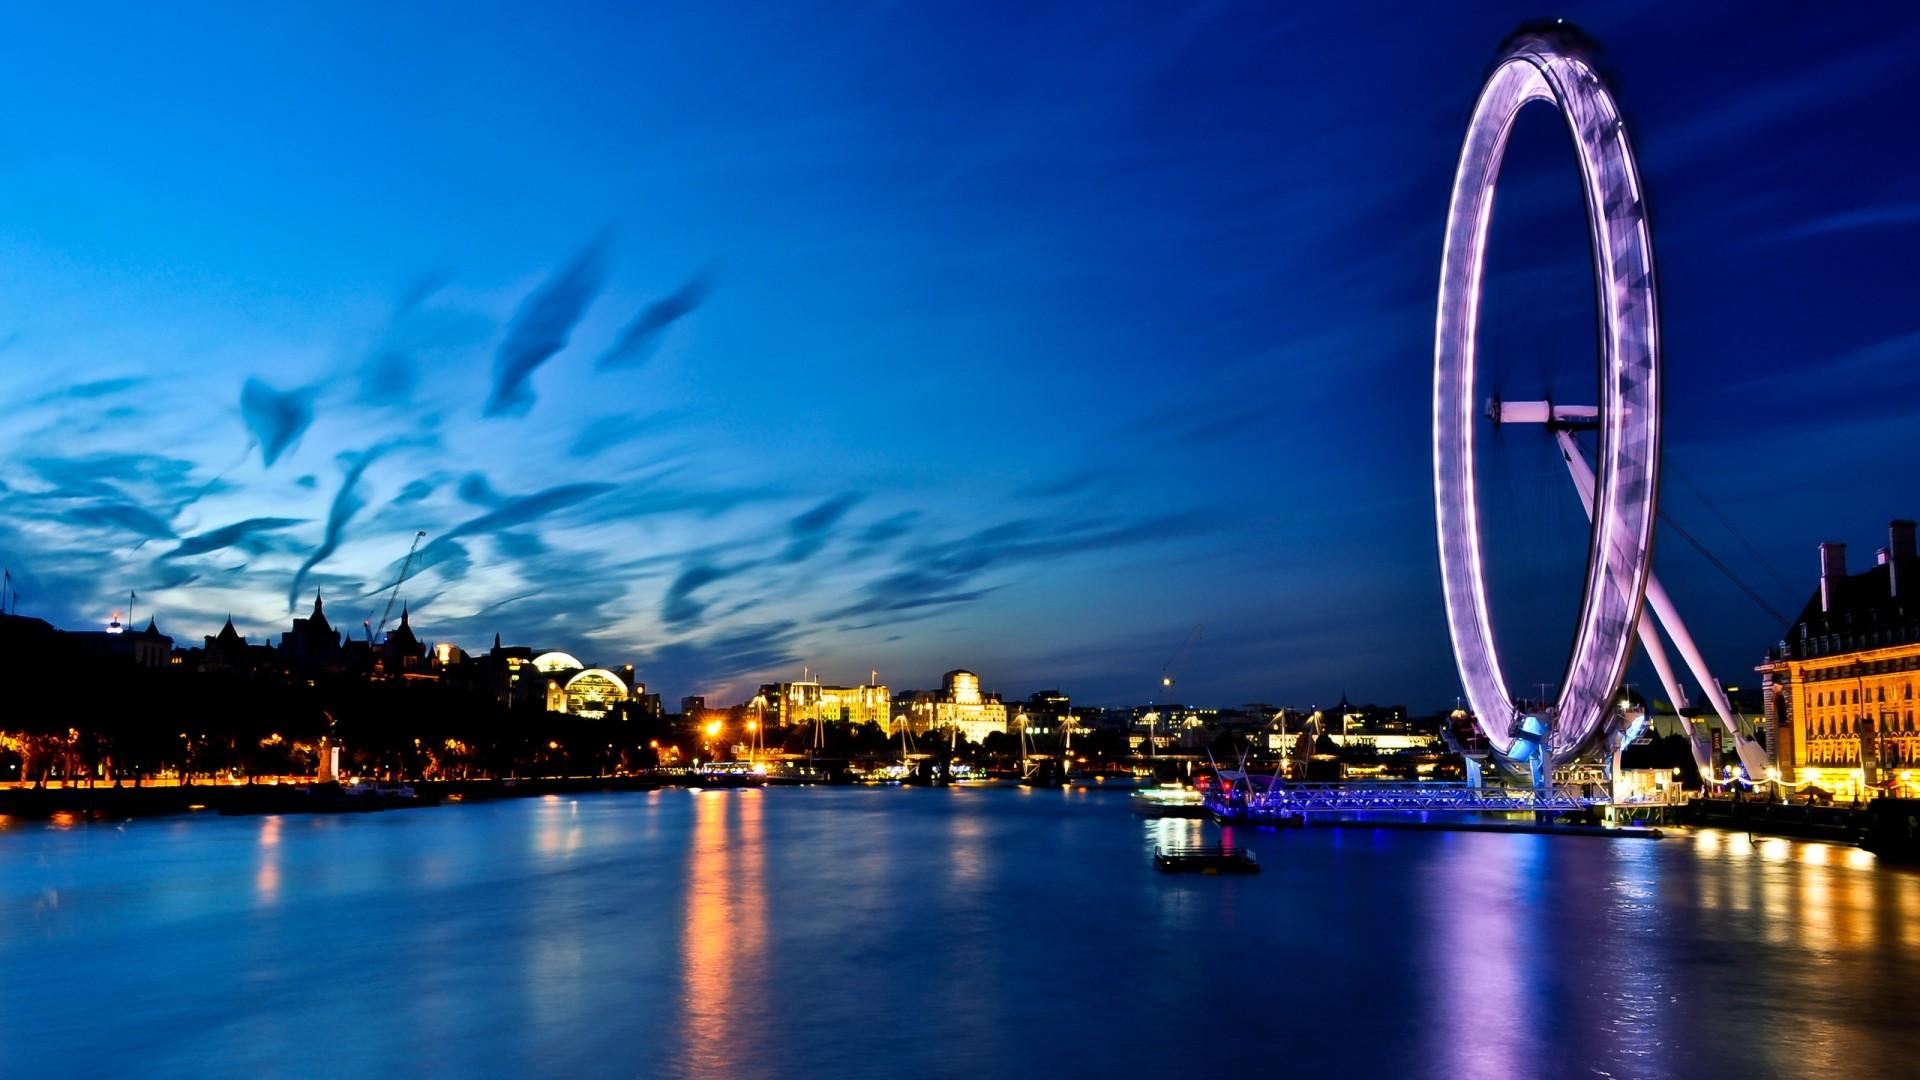 London Eye Lights